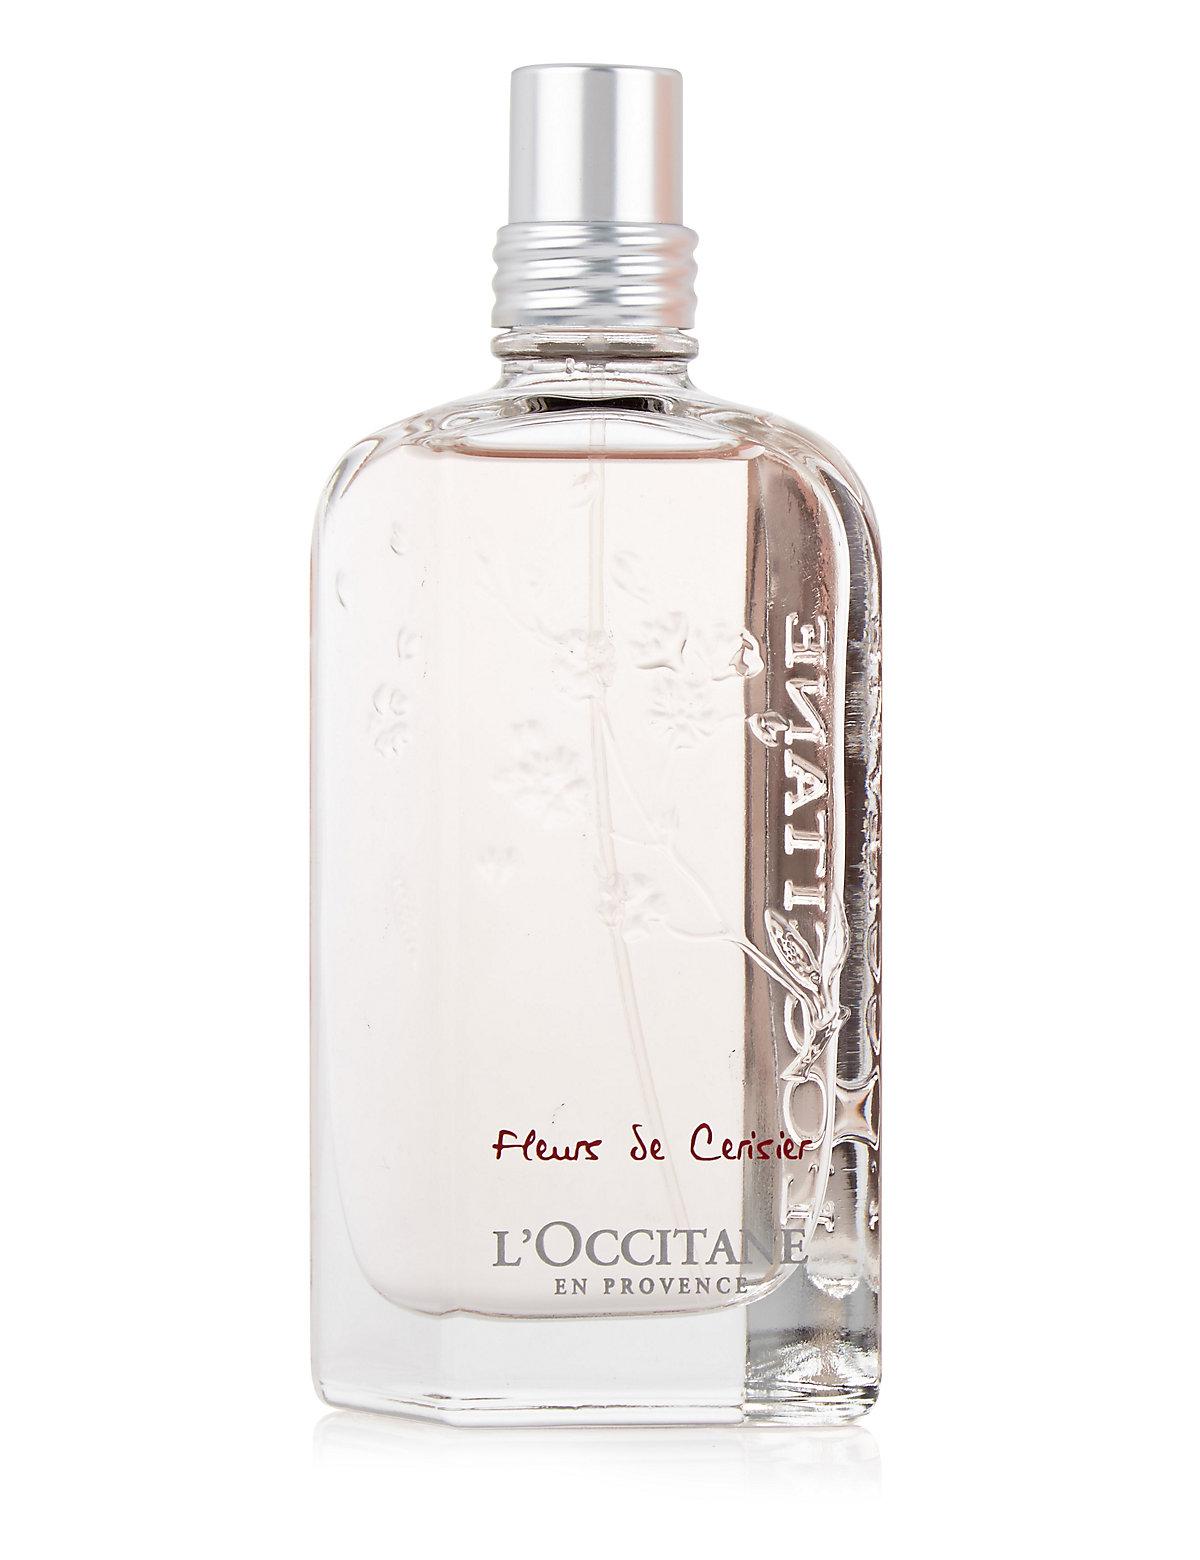 L'Occitane Cherry Blossom Eau de Toilette 75ml